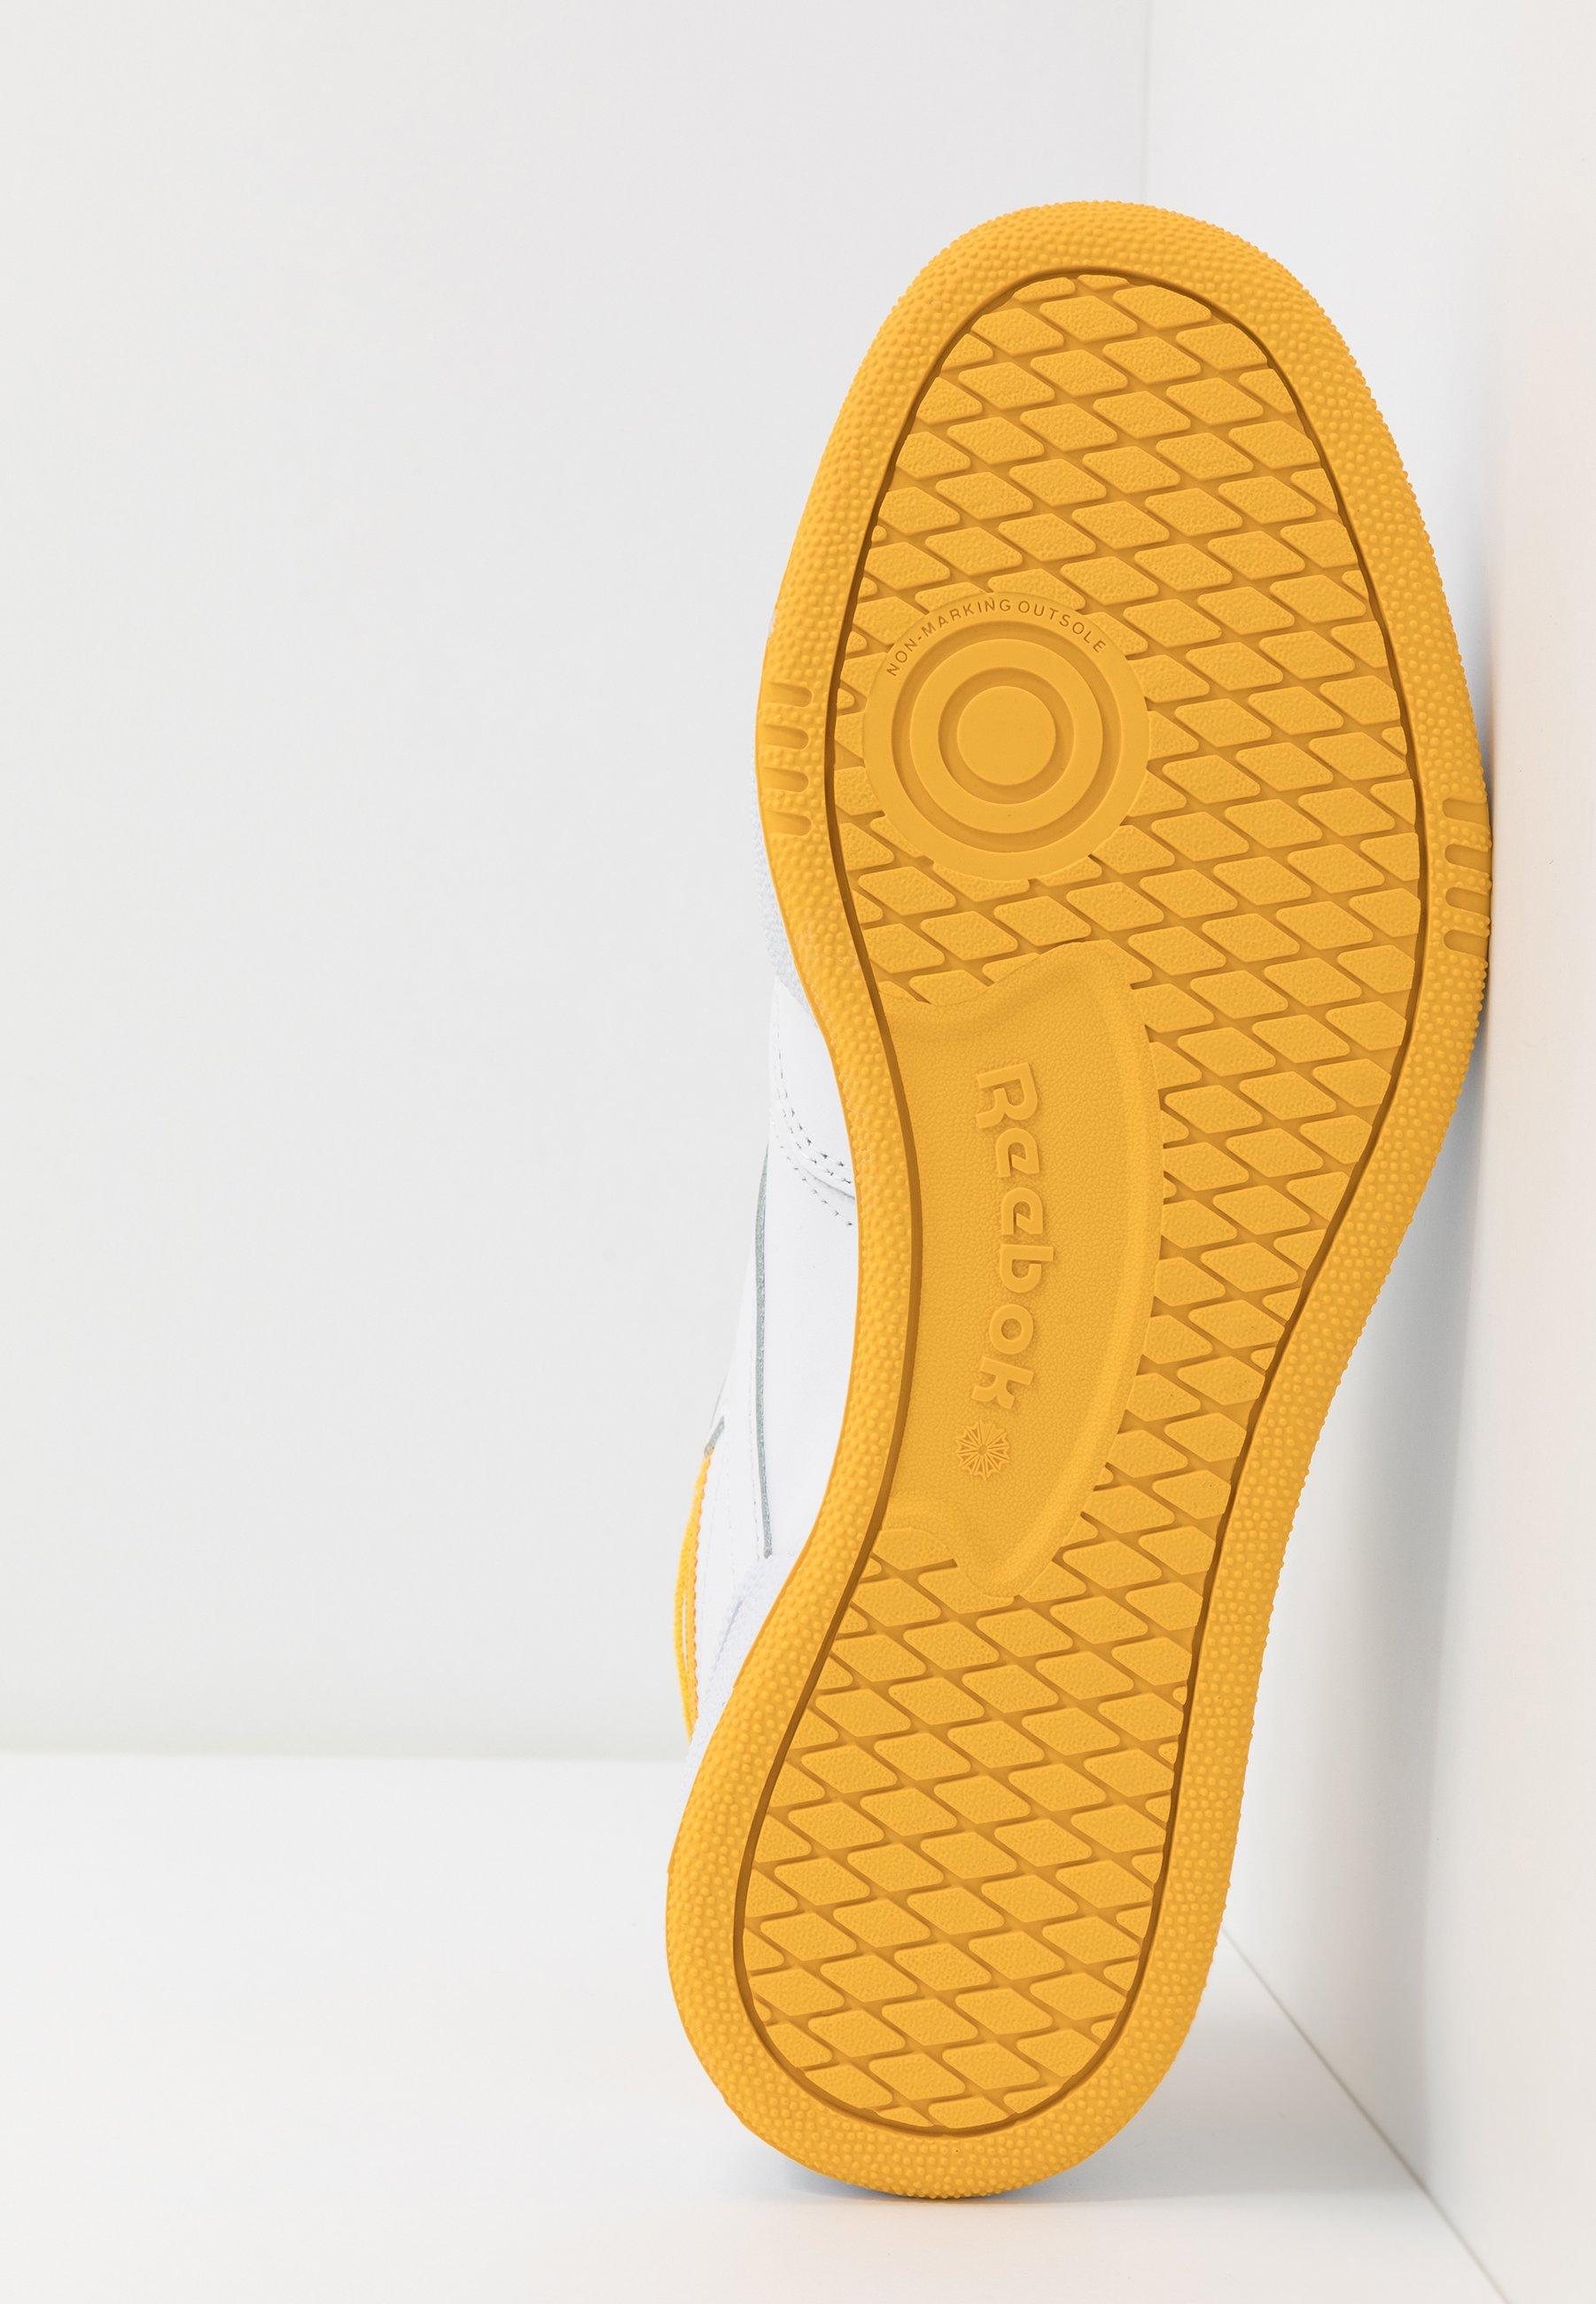 Recomendar barato Reebok Classic CLUB C 85 - Zapatillas - white/fierce gold/black | Calzado de mujer2020 1EmdP